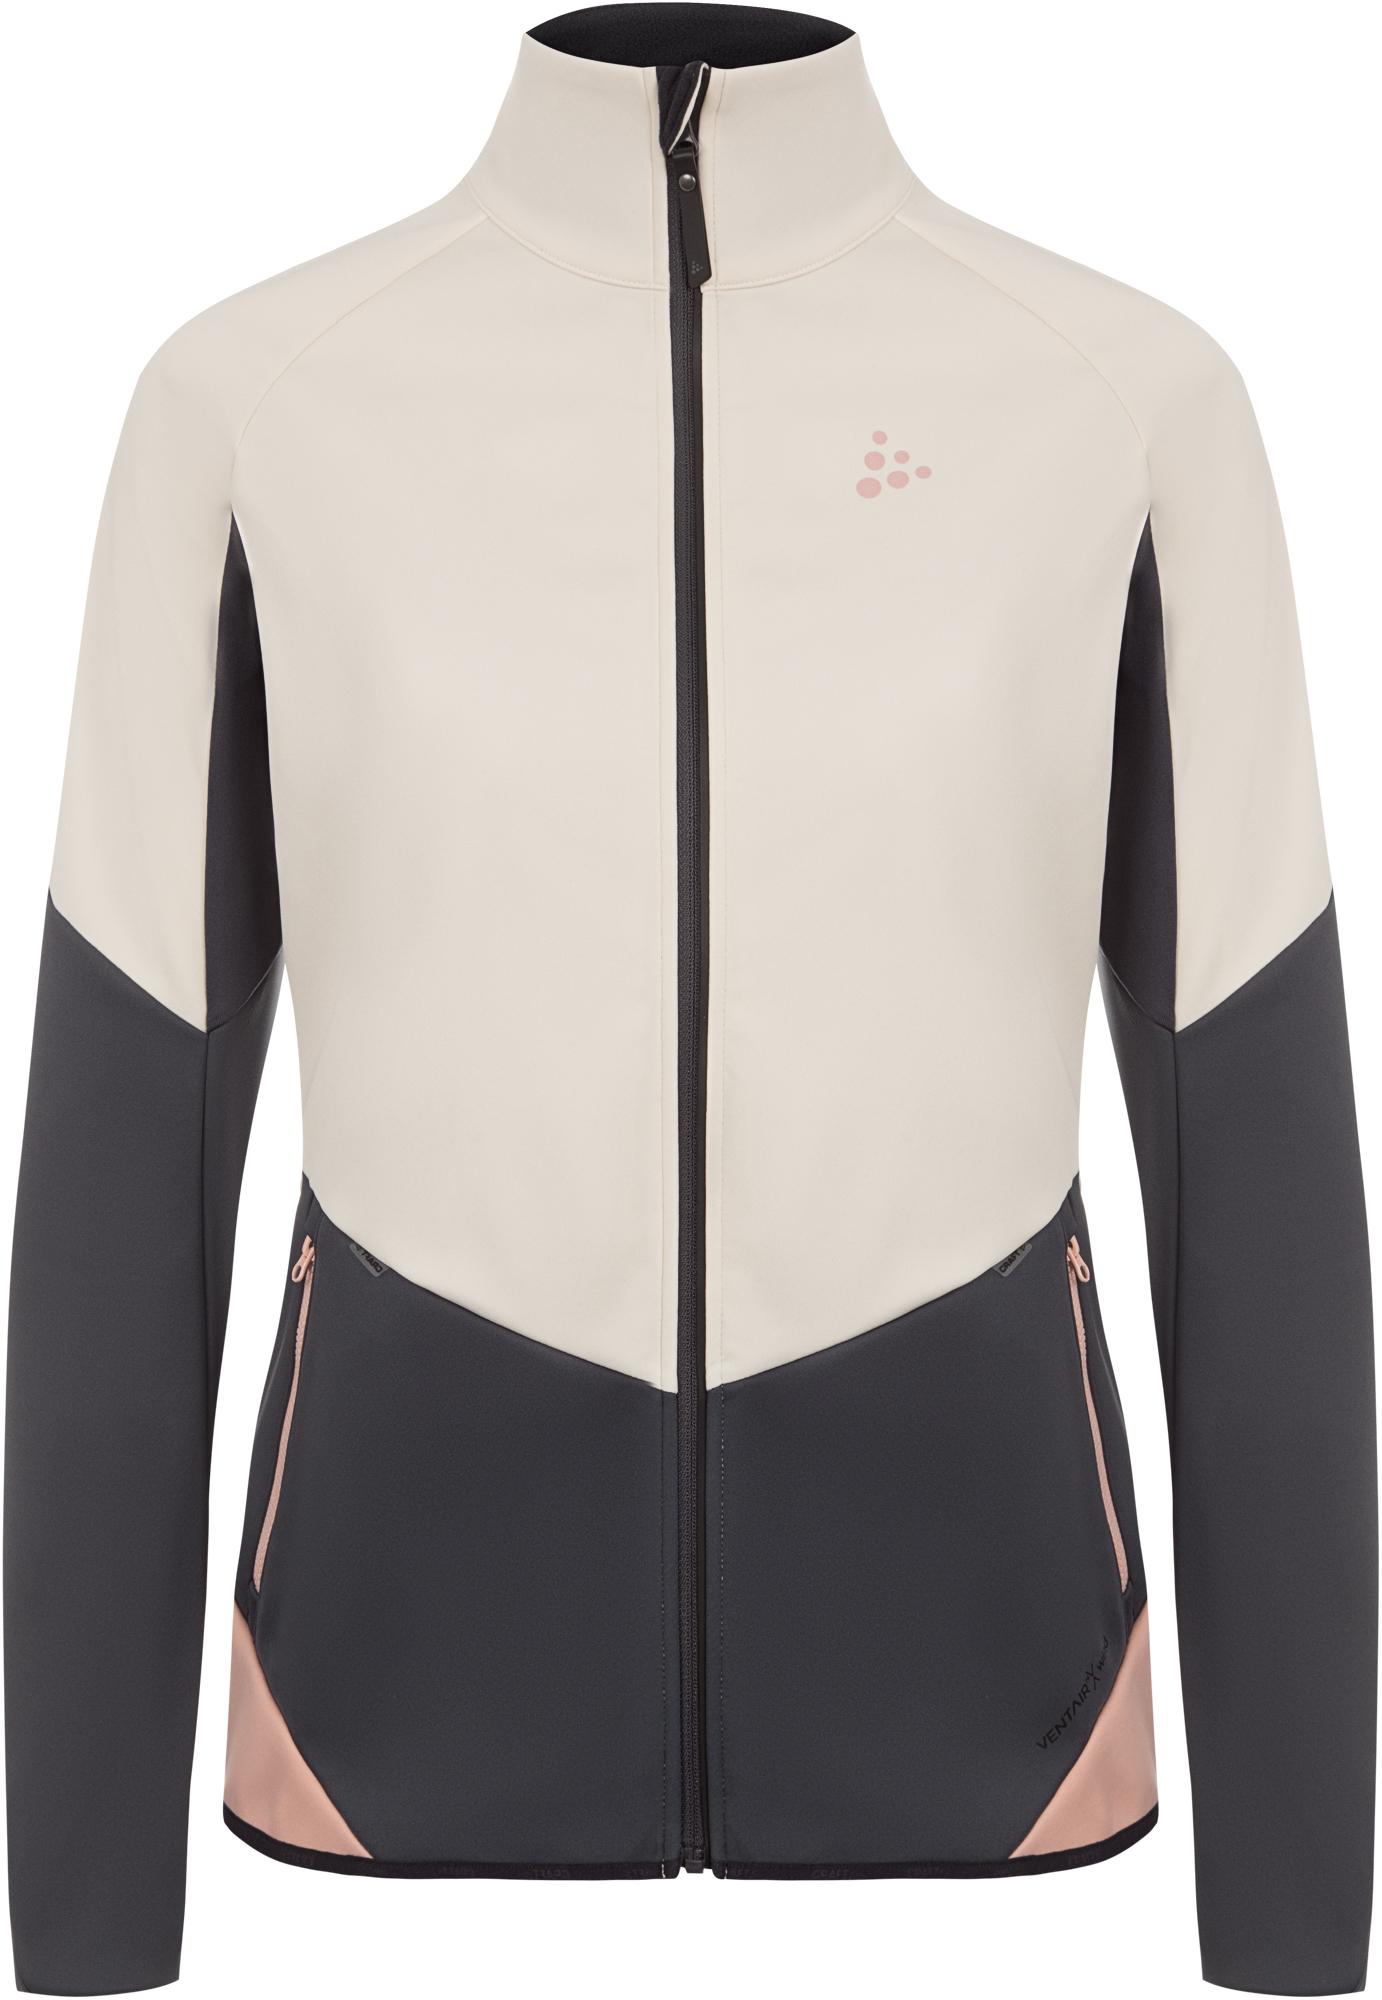 Craft Куртка женская Glide, размер 48-50